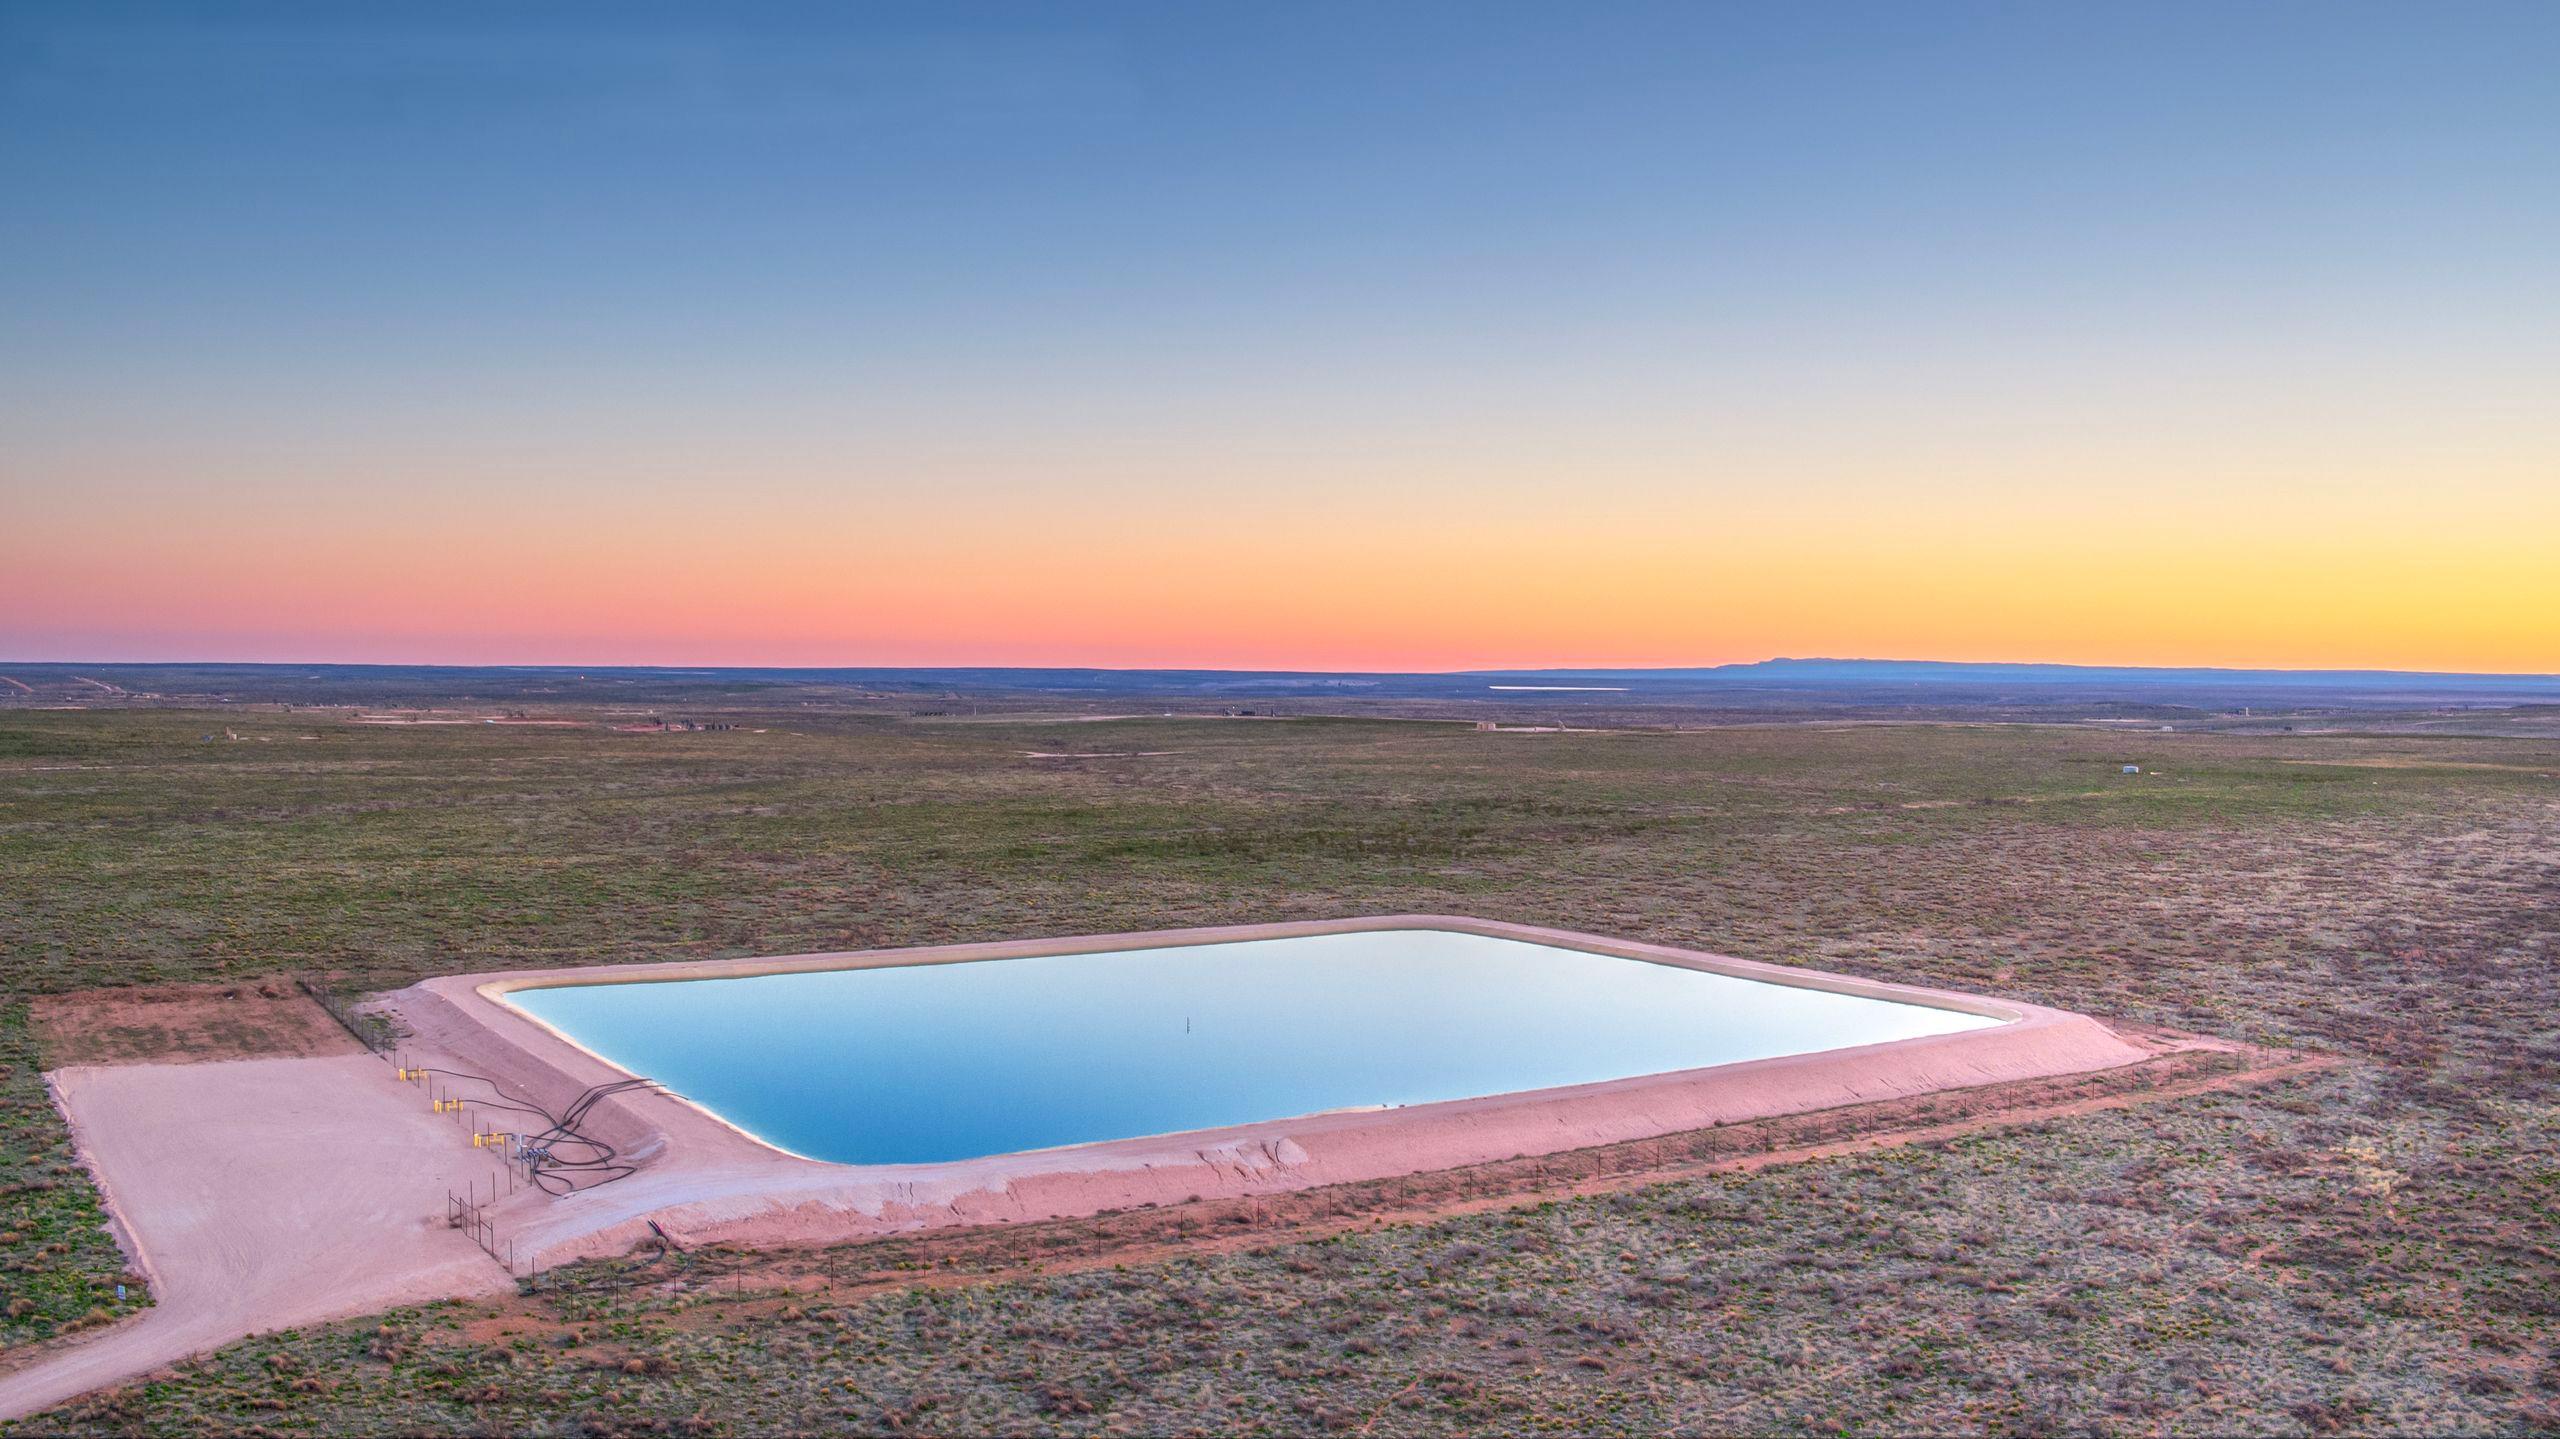 Frac pond with sunset